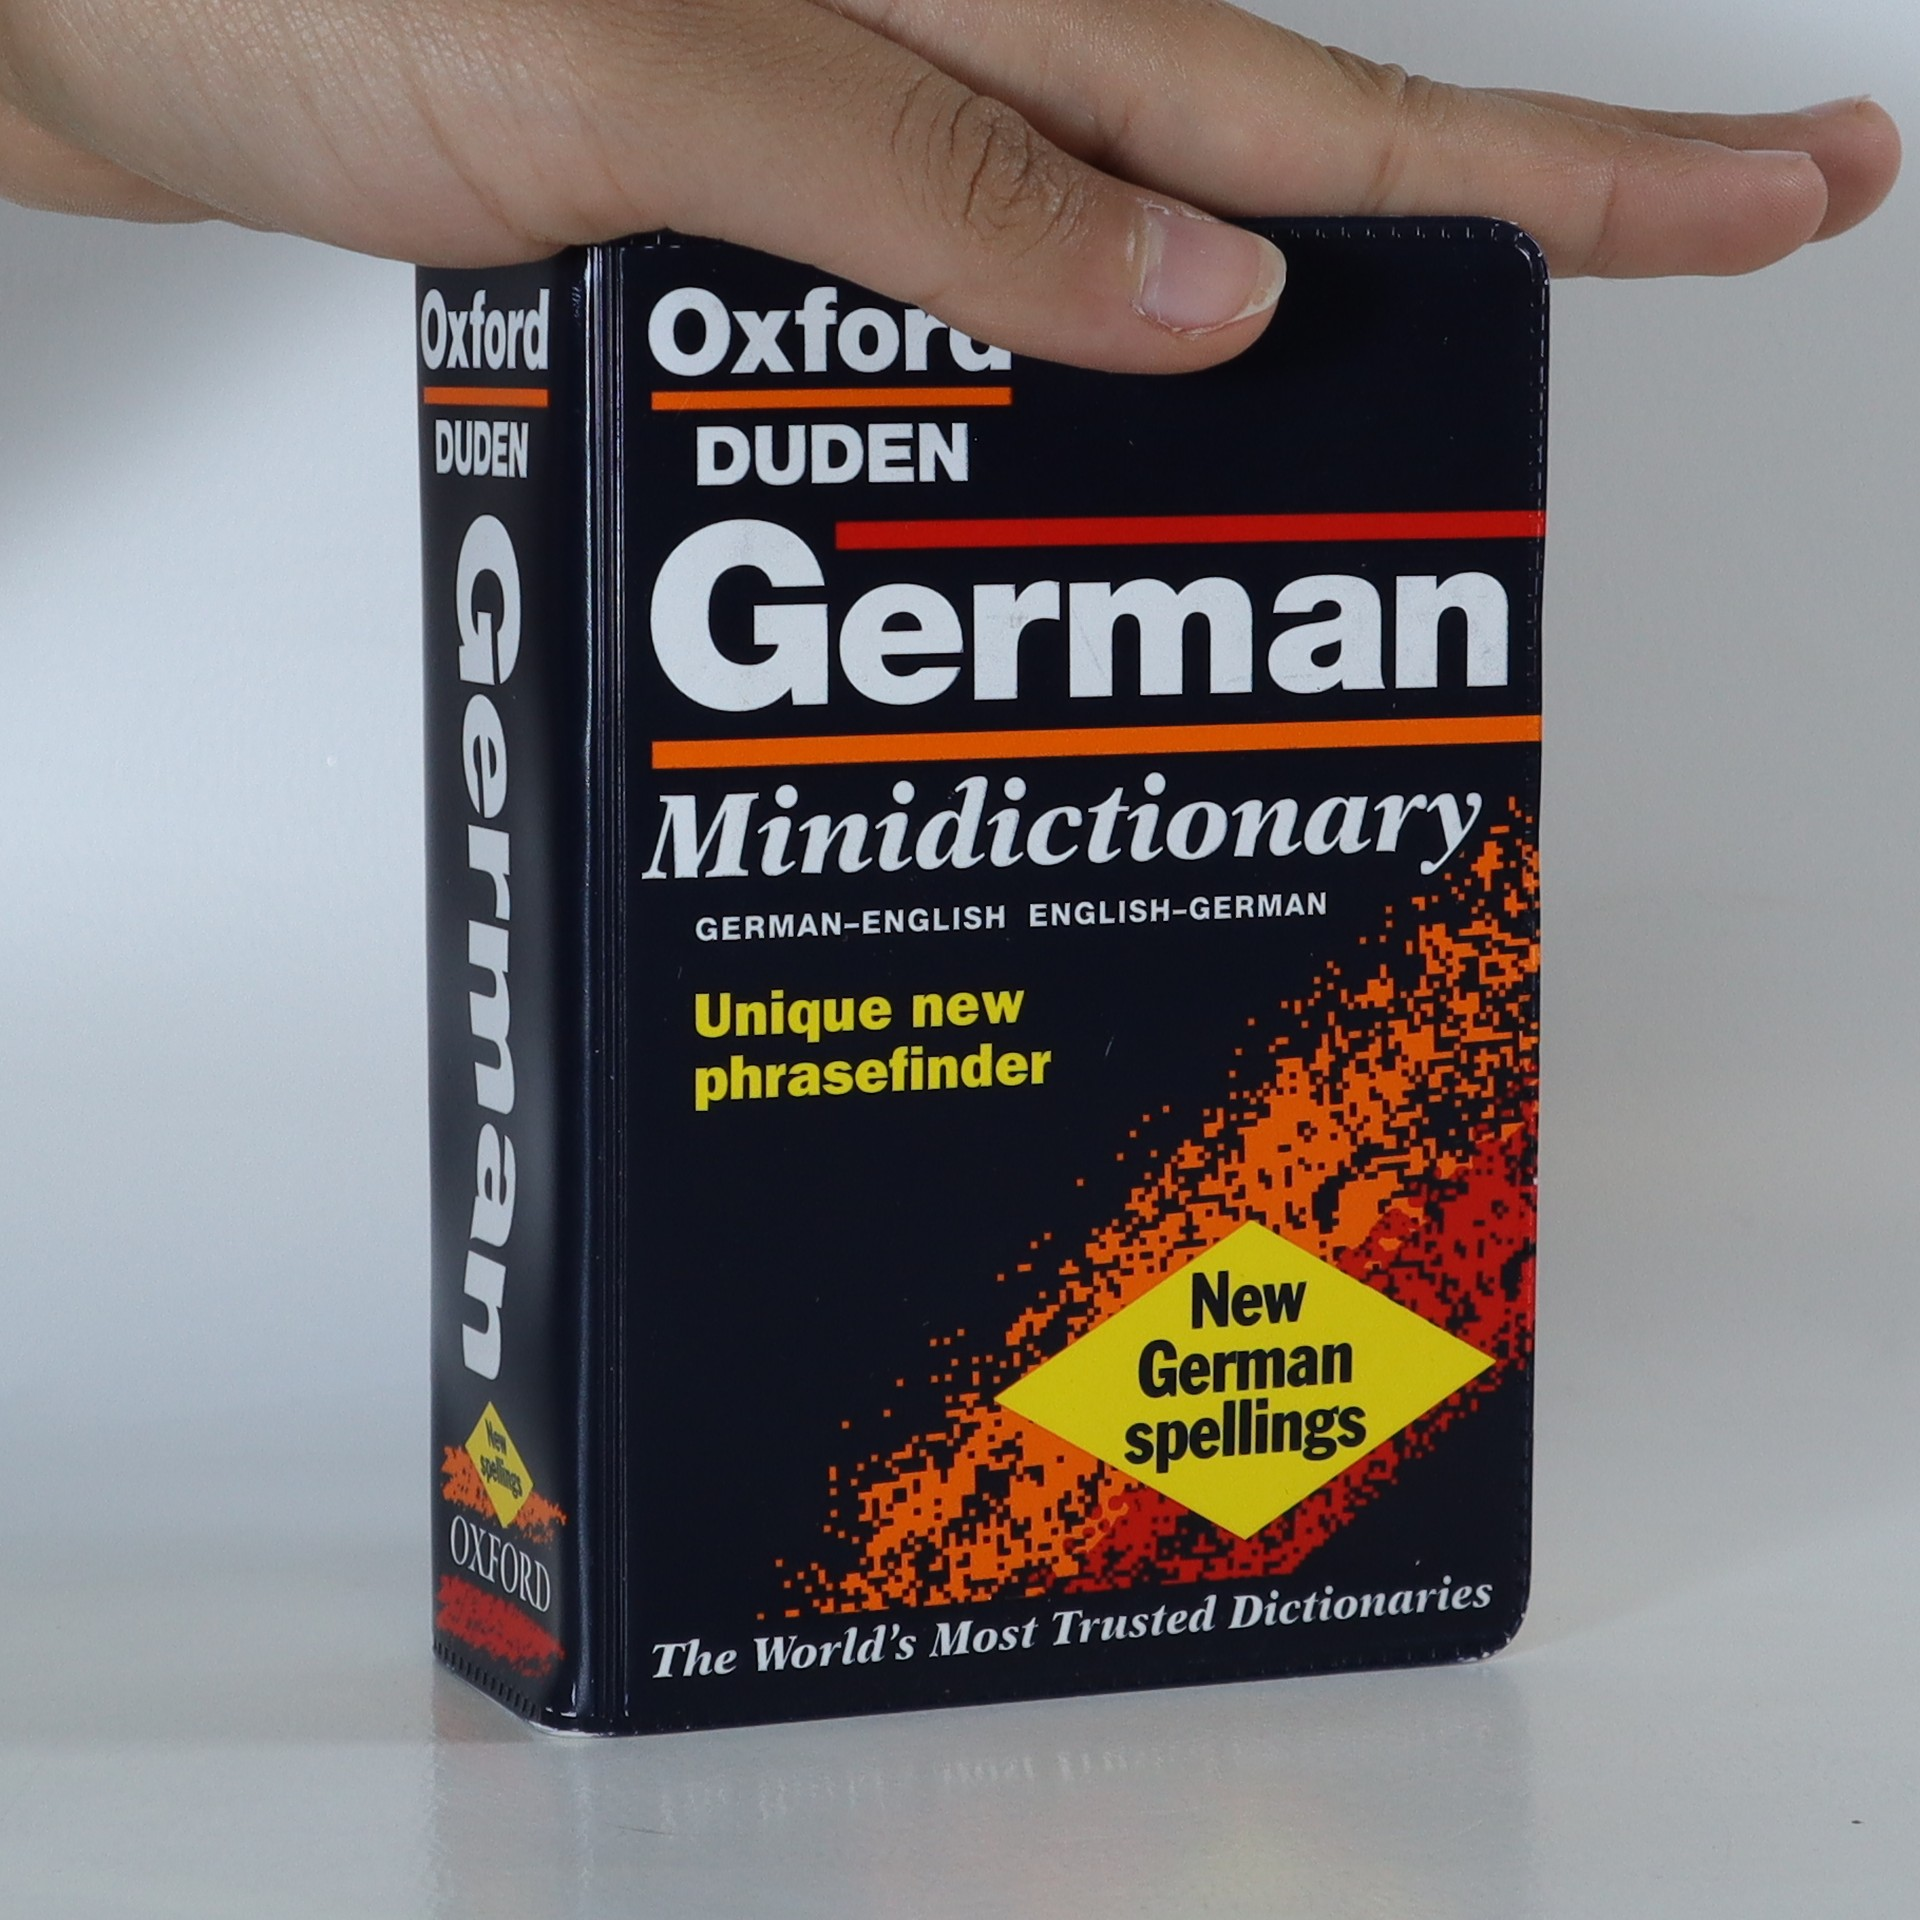 antikvární kniha Oxford Duden German minidictionary, 1999